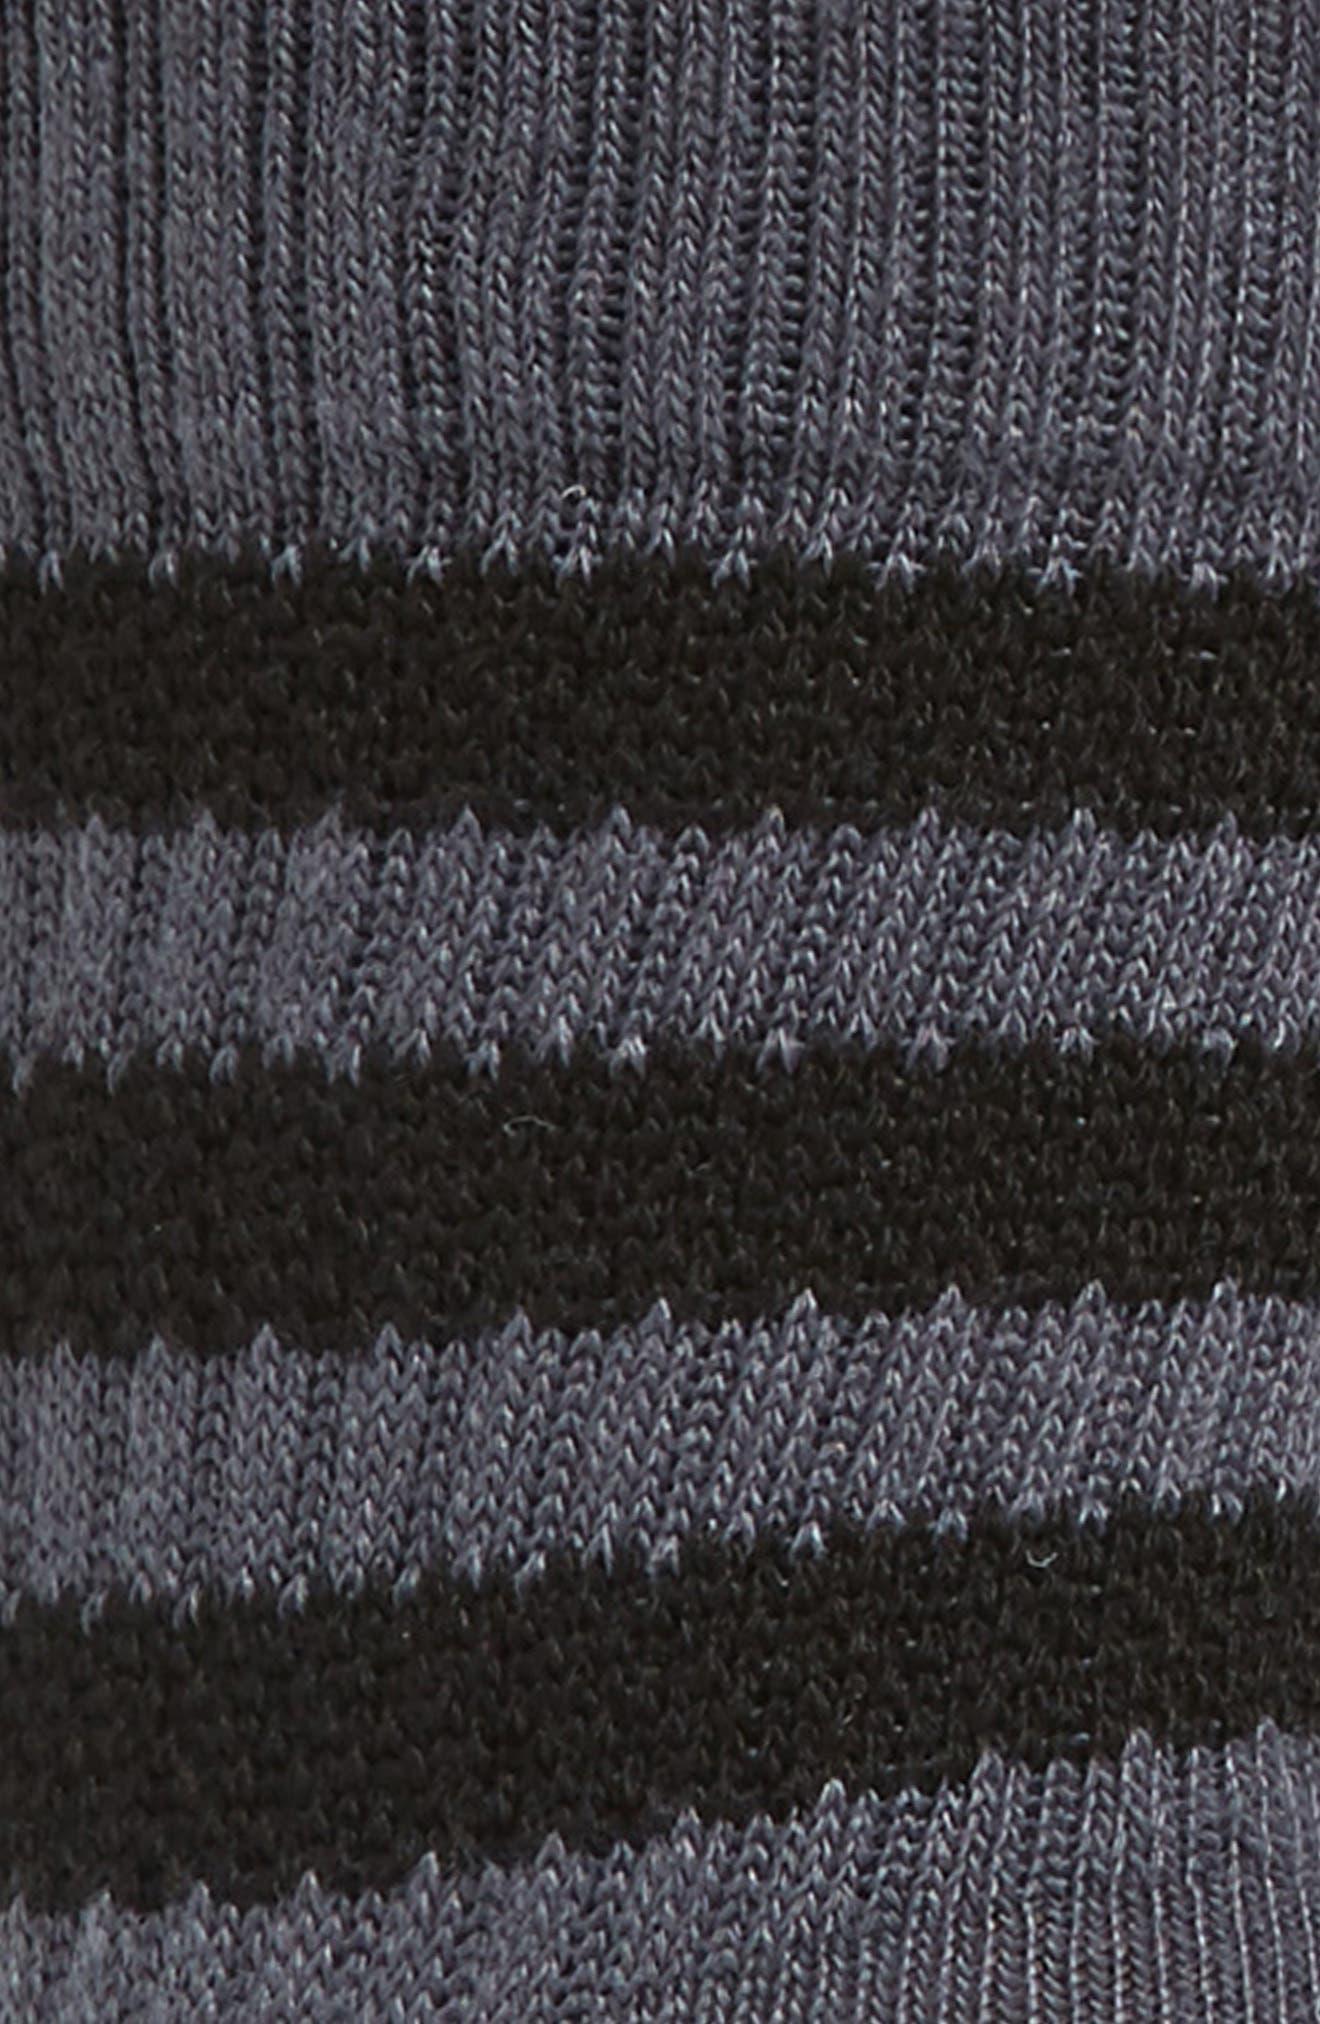 Textured 3-Stripes Crew Socks,                             Alternate thumbnail 2, color,                             Onyx/ Black